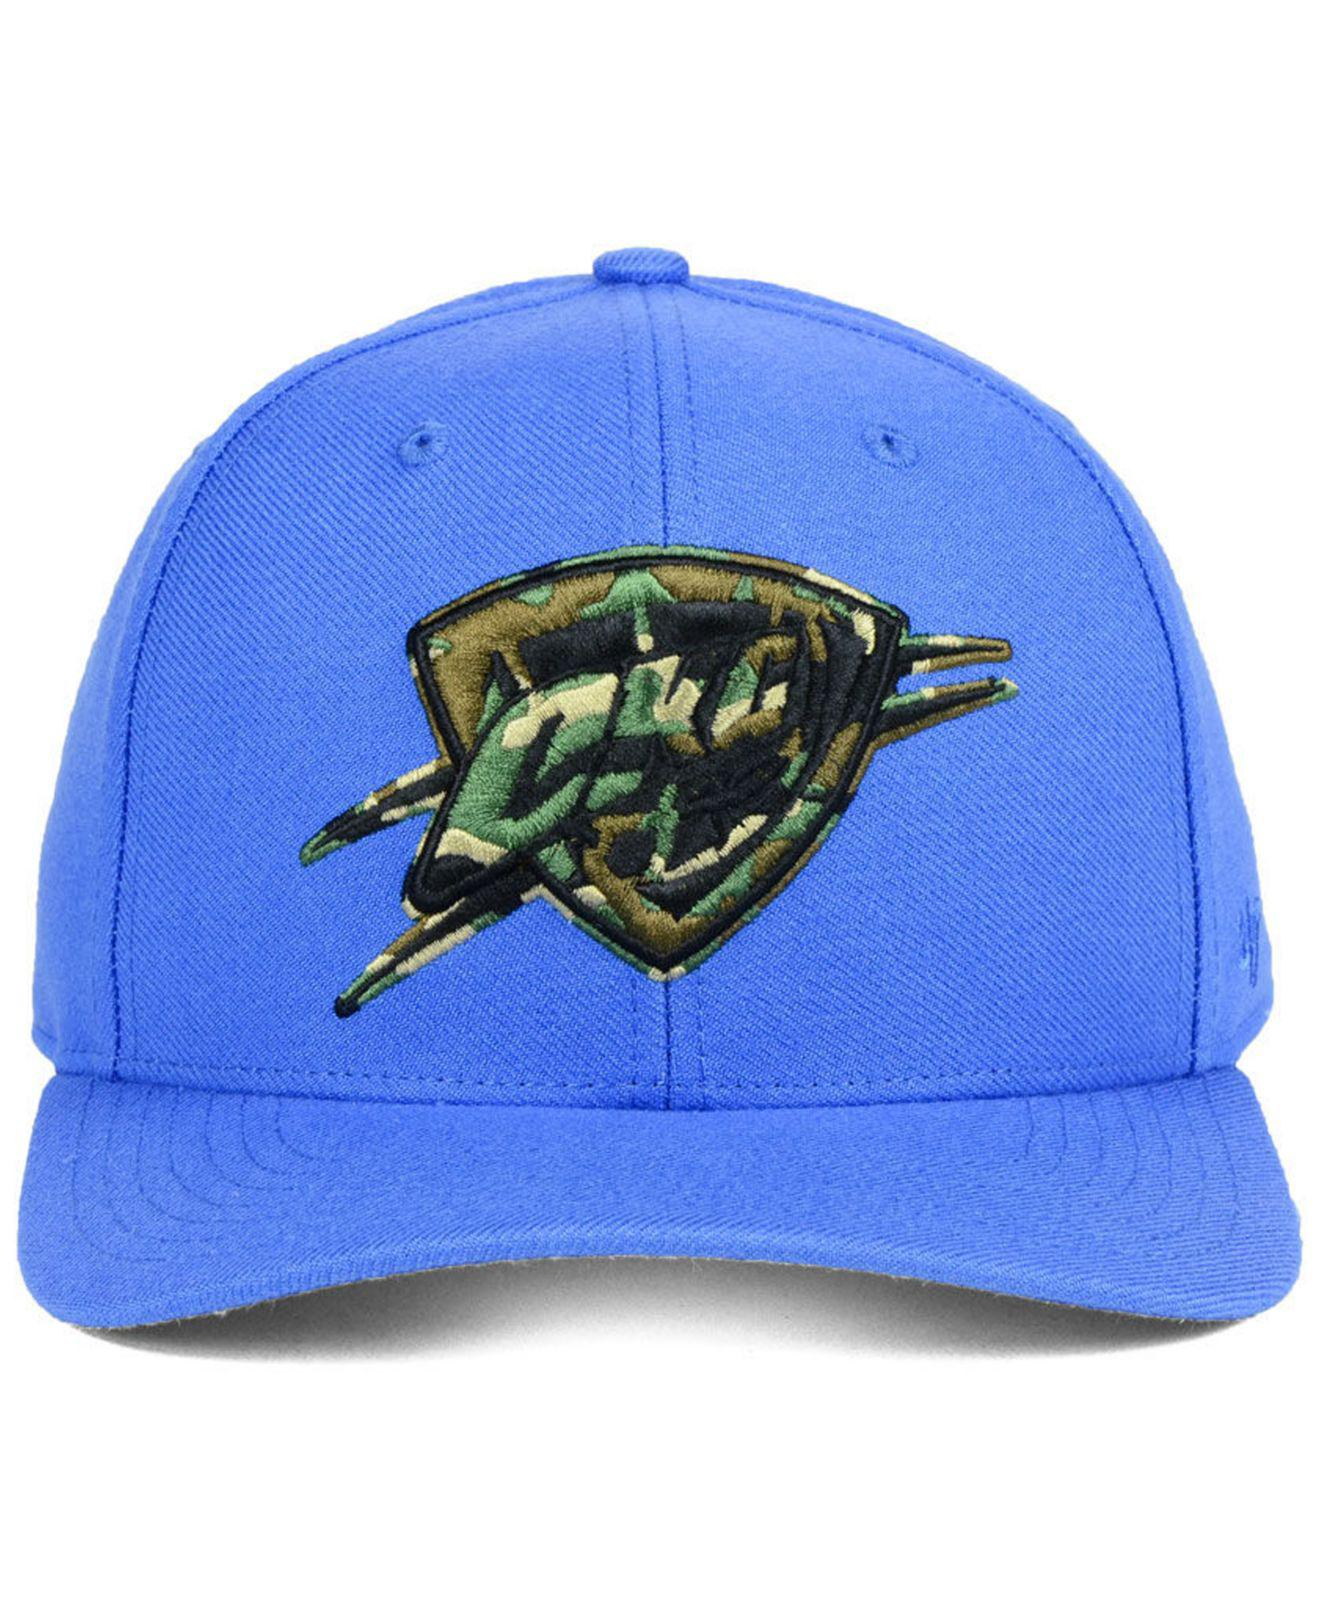 Lyst - 47 Brand Oklahoma City Thunder Camfill Mvp Cap in Blue for Men -  Save 35.483870967741936% 72274aa22d61